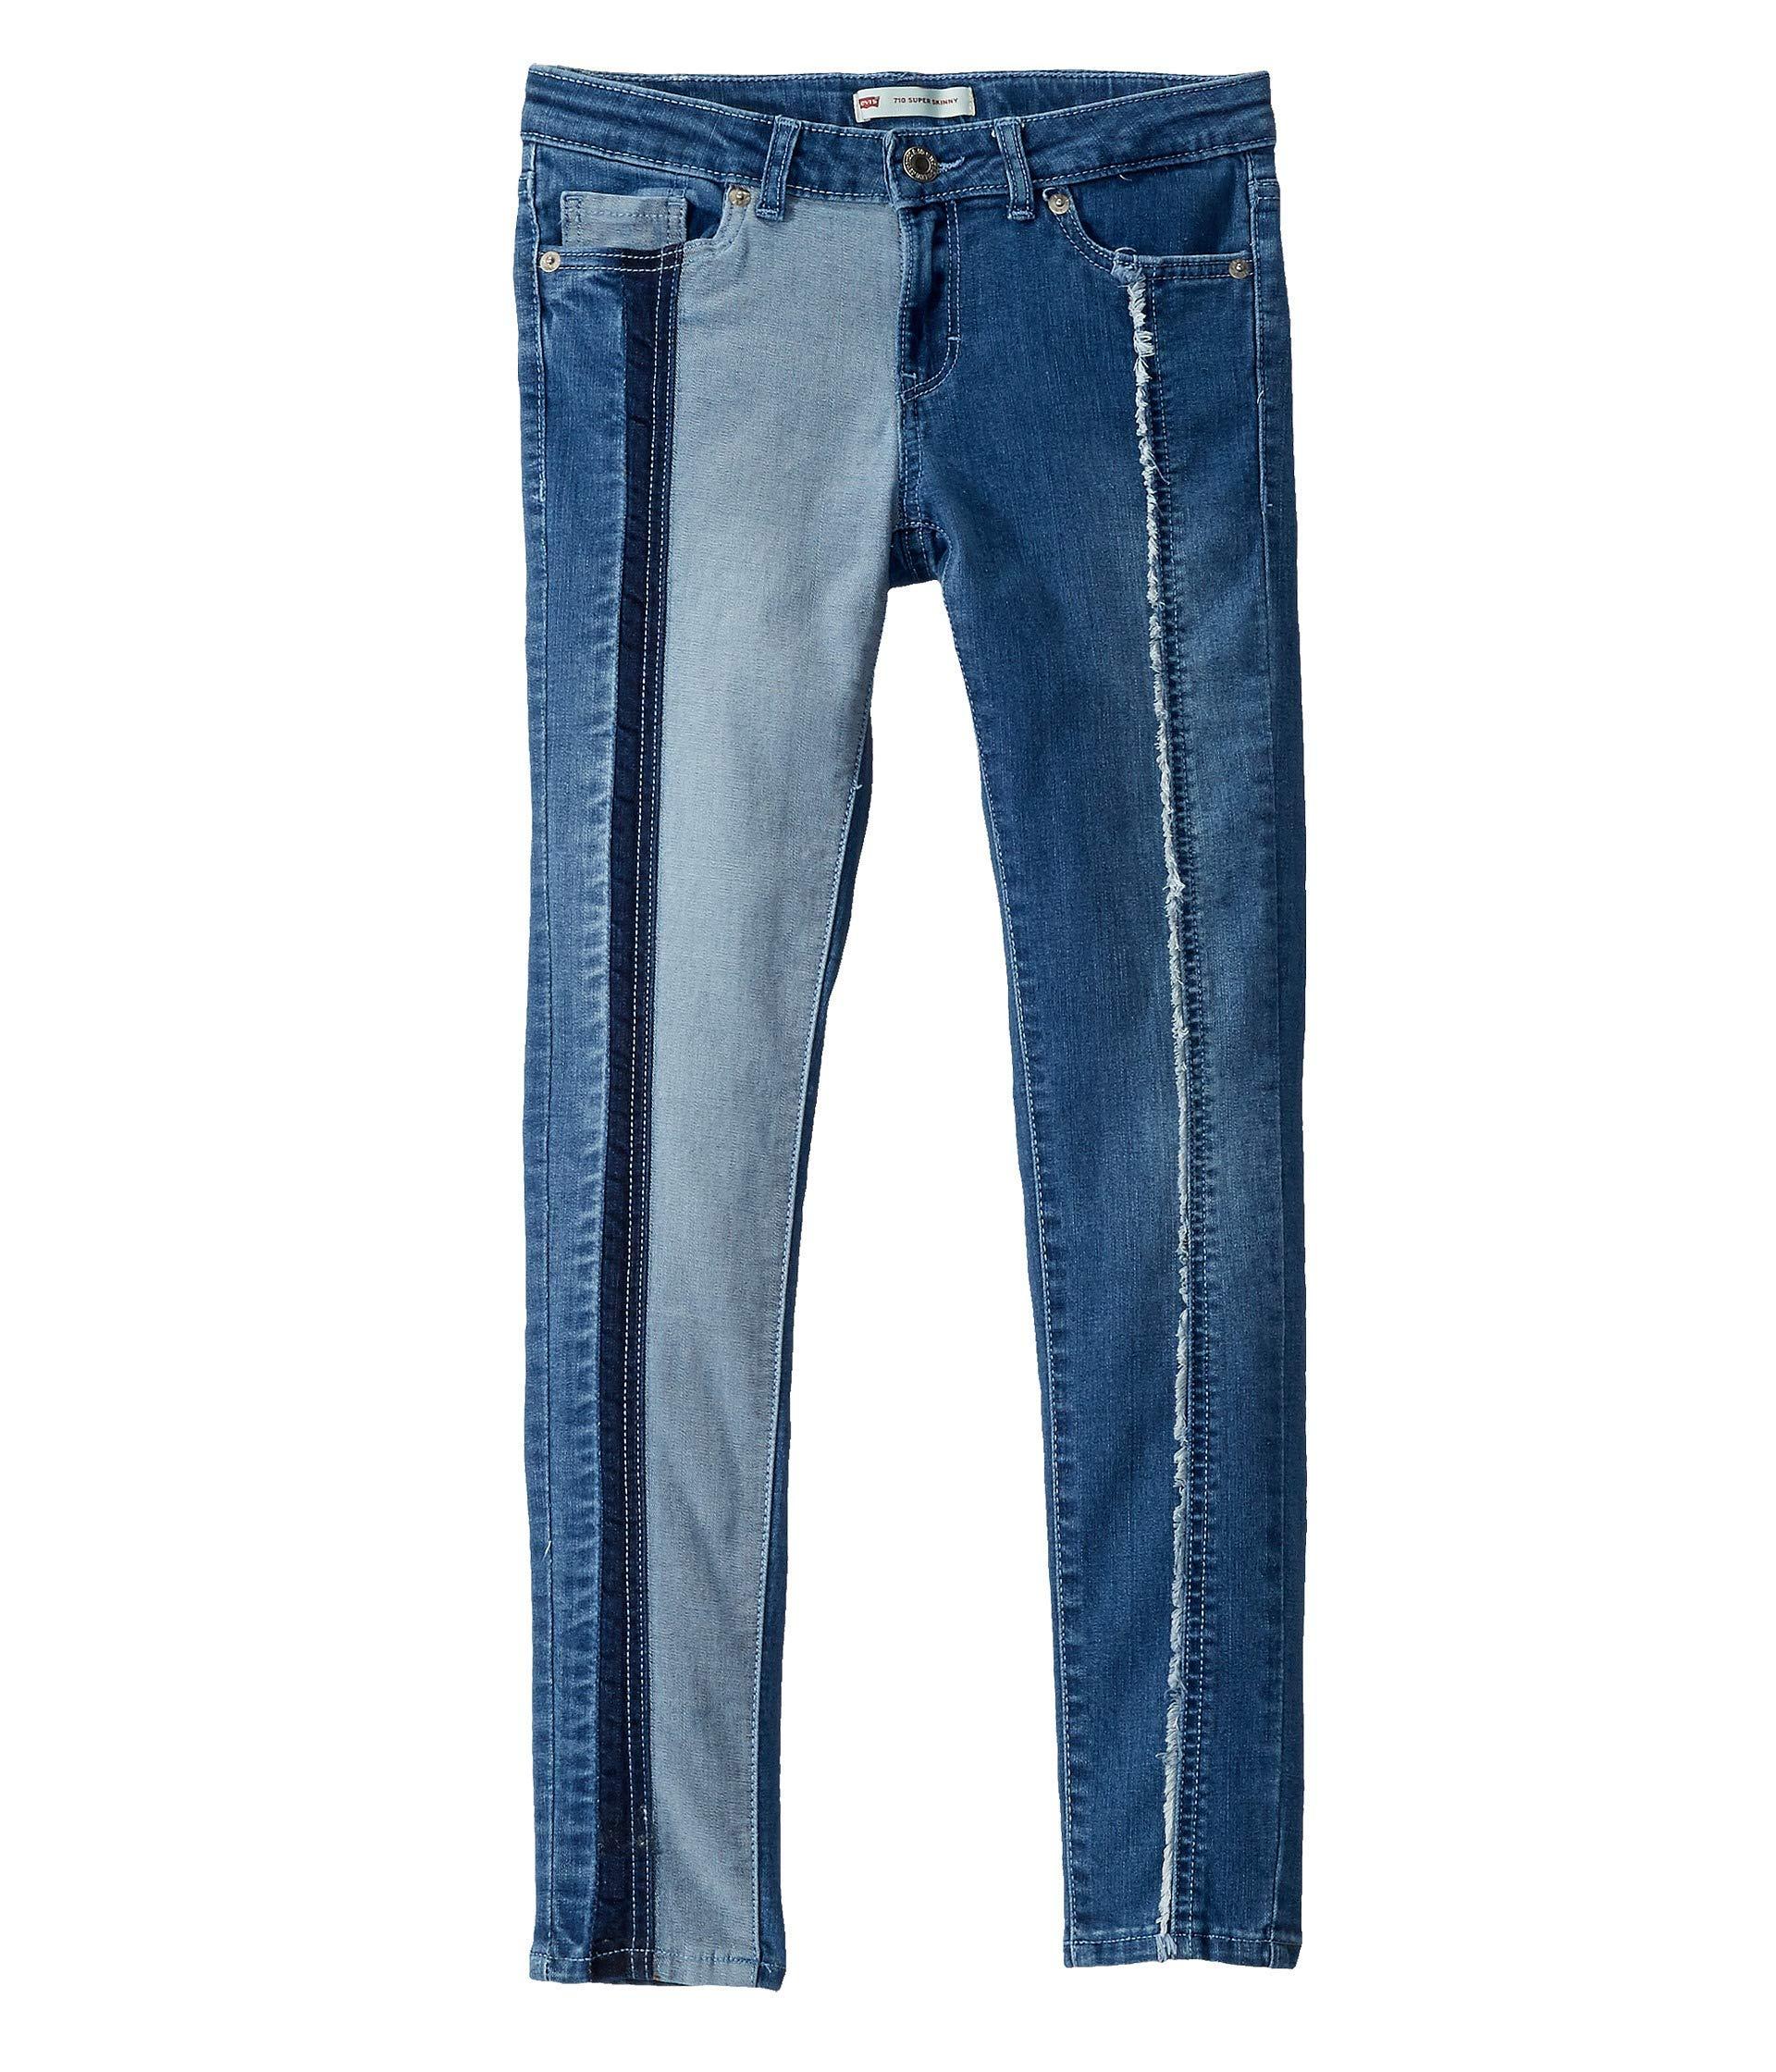 Levi's Girls' Big 710 Super Skinny Fit Jeans, Clean